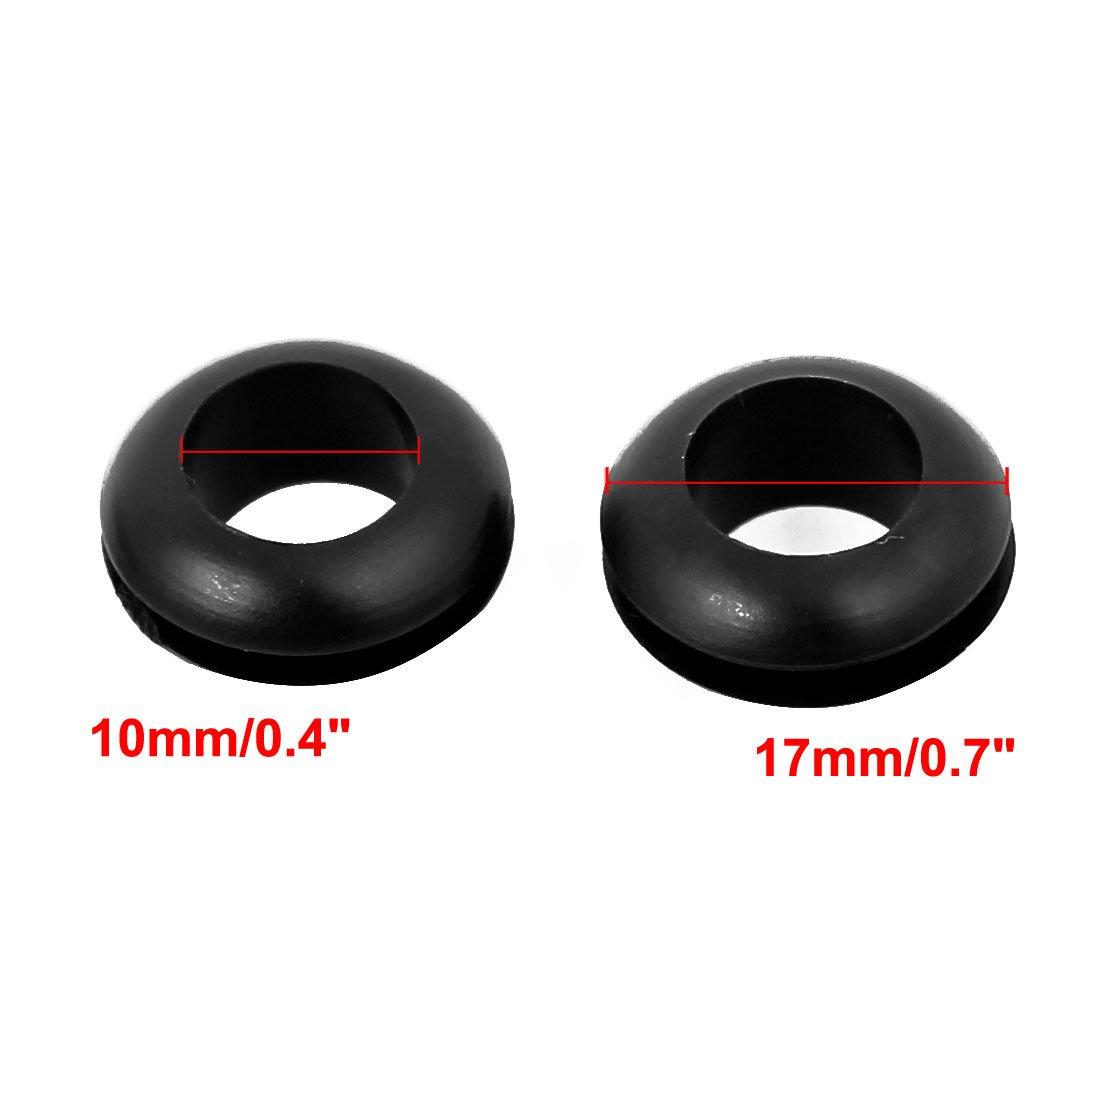 Pasacables de goma de junta de anillo Protector de cable 10 mm de di/ám. sourcingmap/® 50 PCS